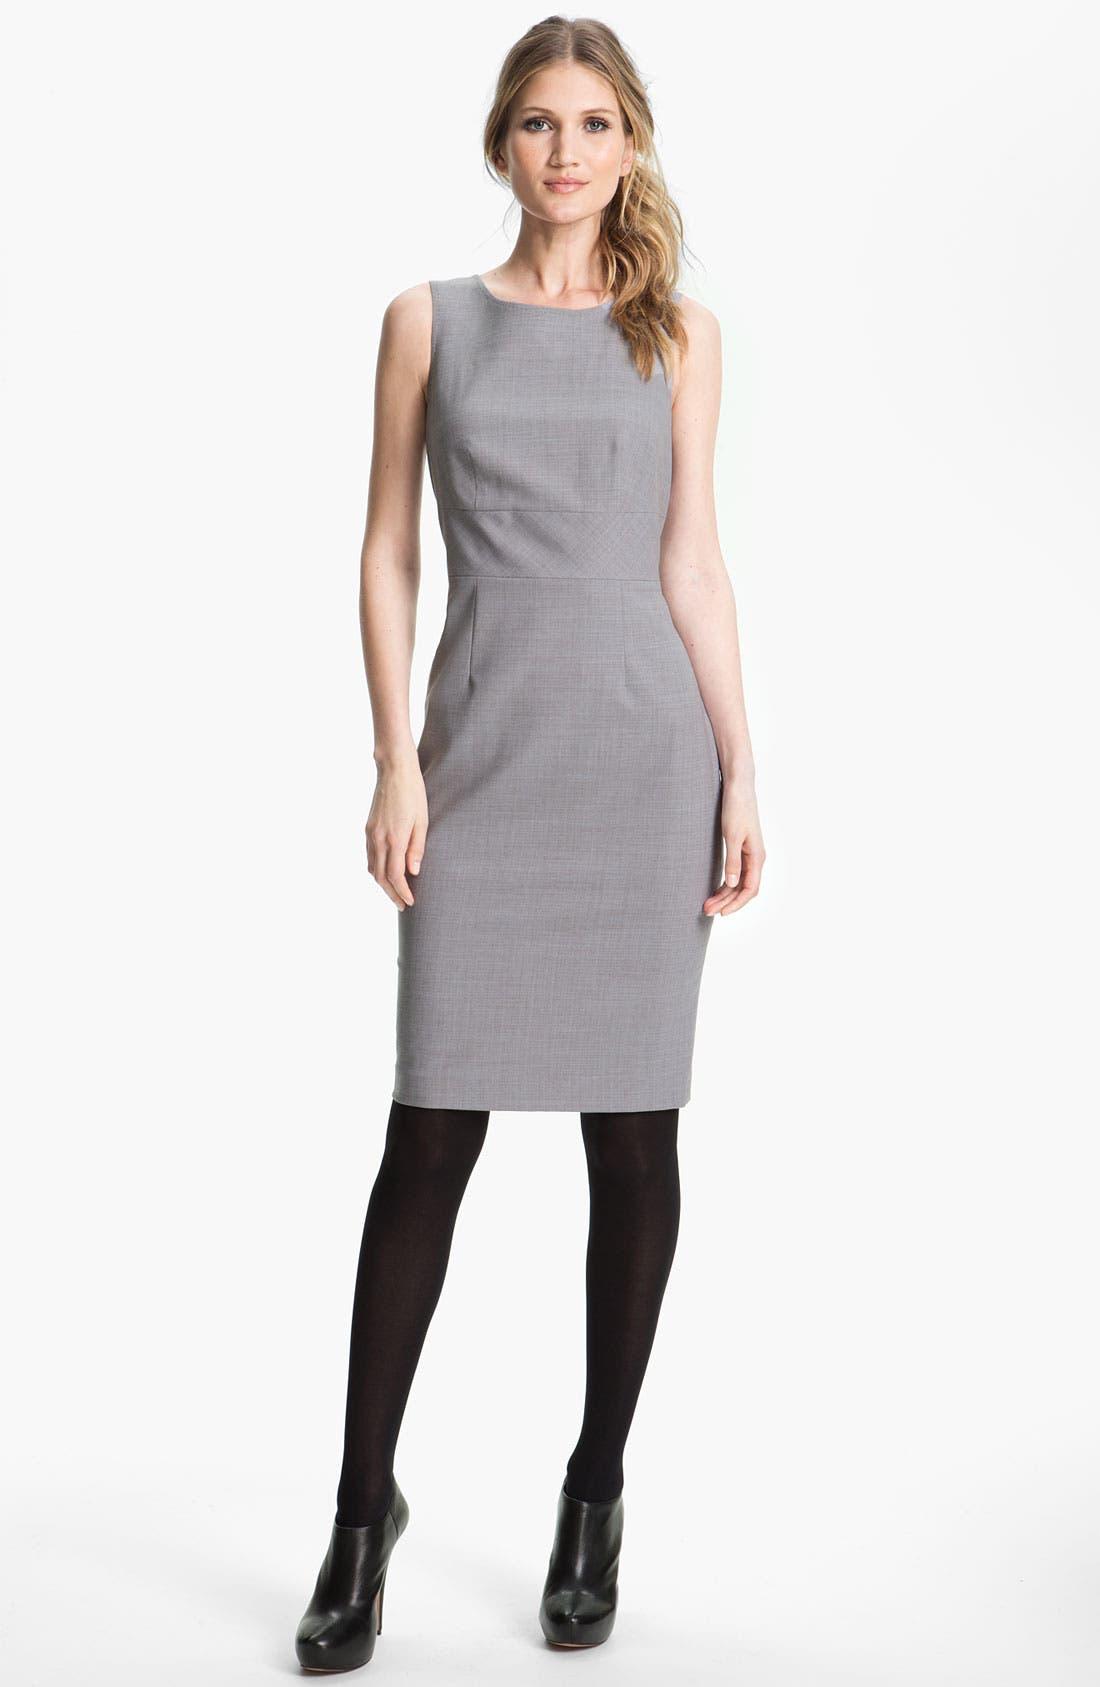 Alternate Image 1 Selected - Santorelli 'Luna' Dress